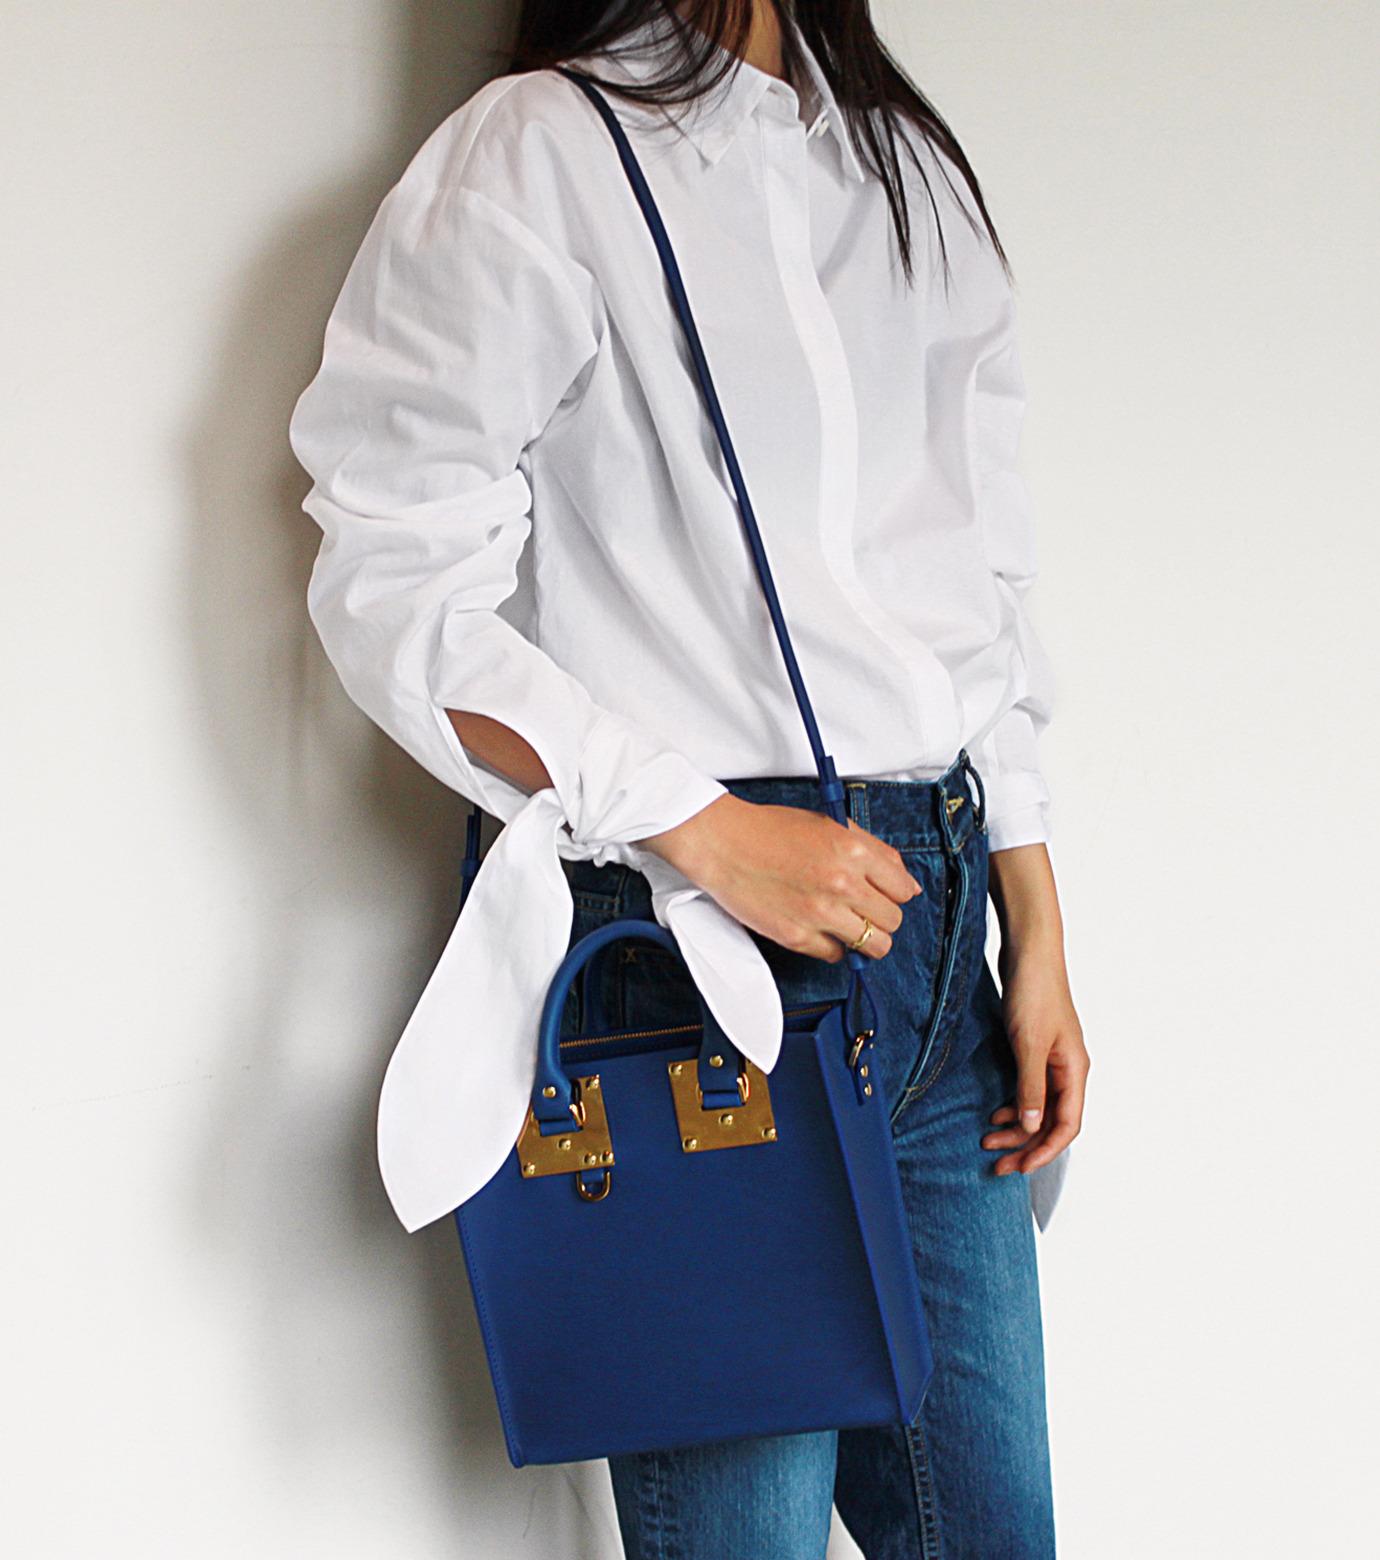 LE CIEL BLEU(ルシェルブルー)のストレートデニムパンツ-INDIGO(パンツ/pants)-18A68202 拡大詳細画像4